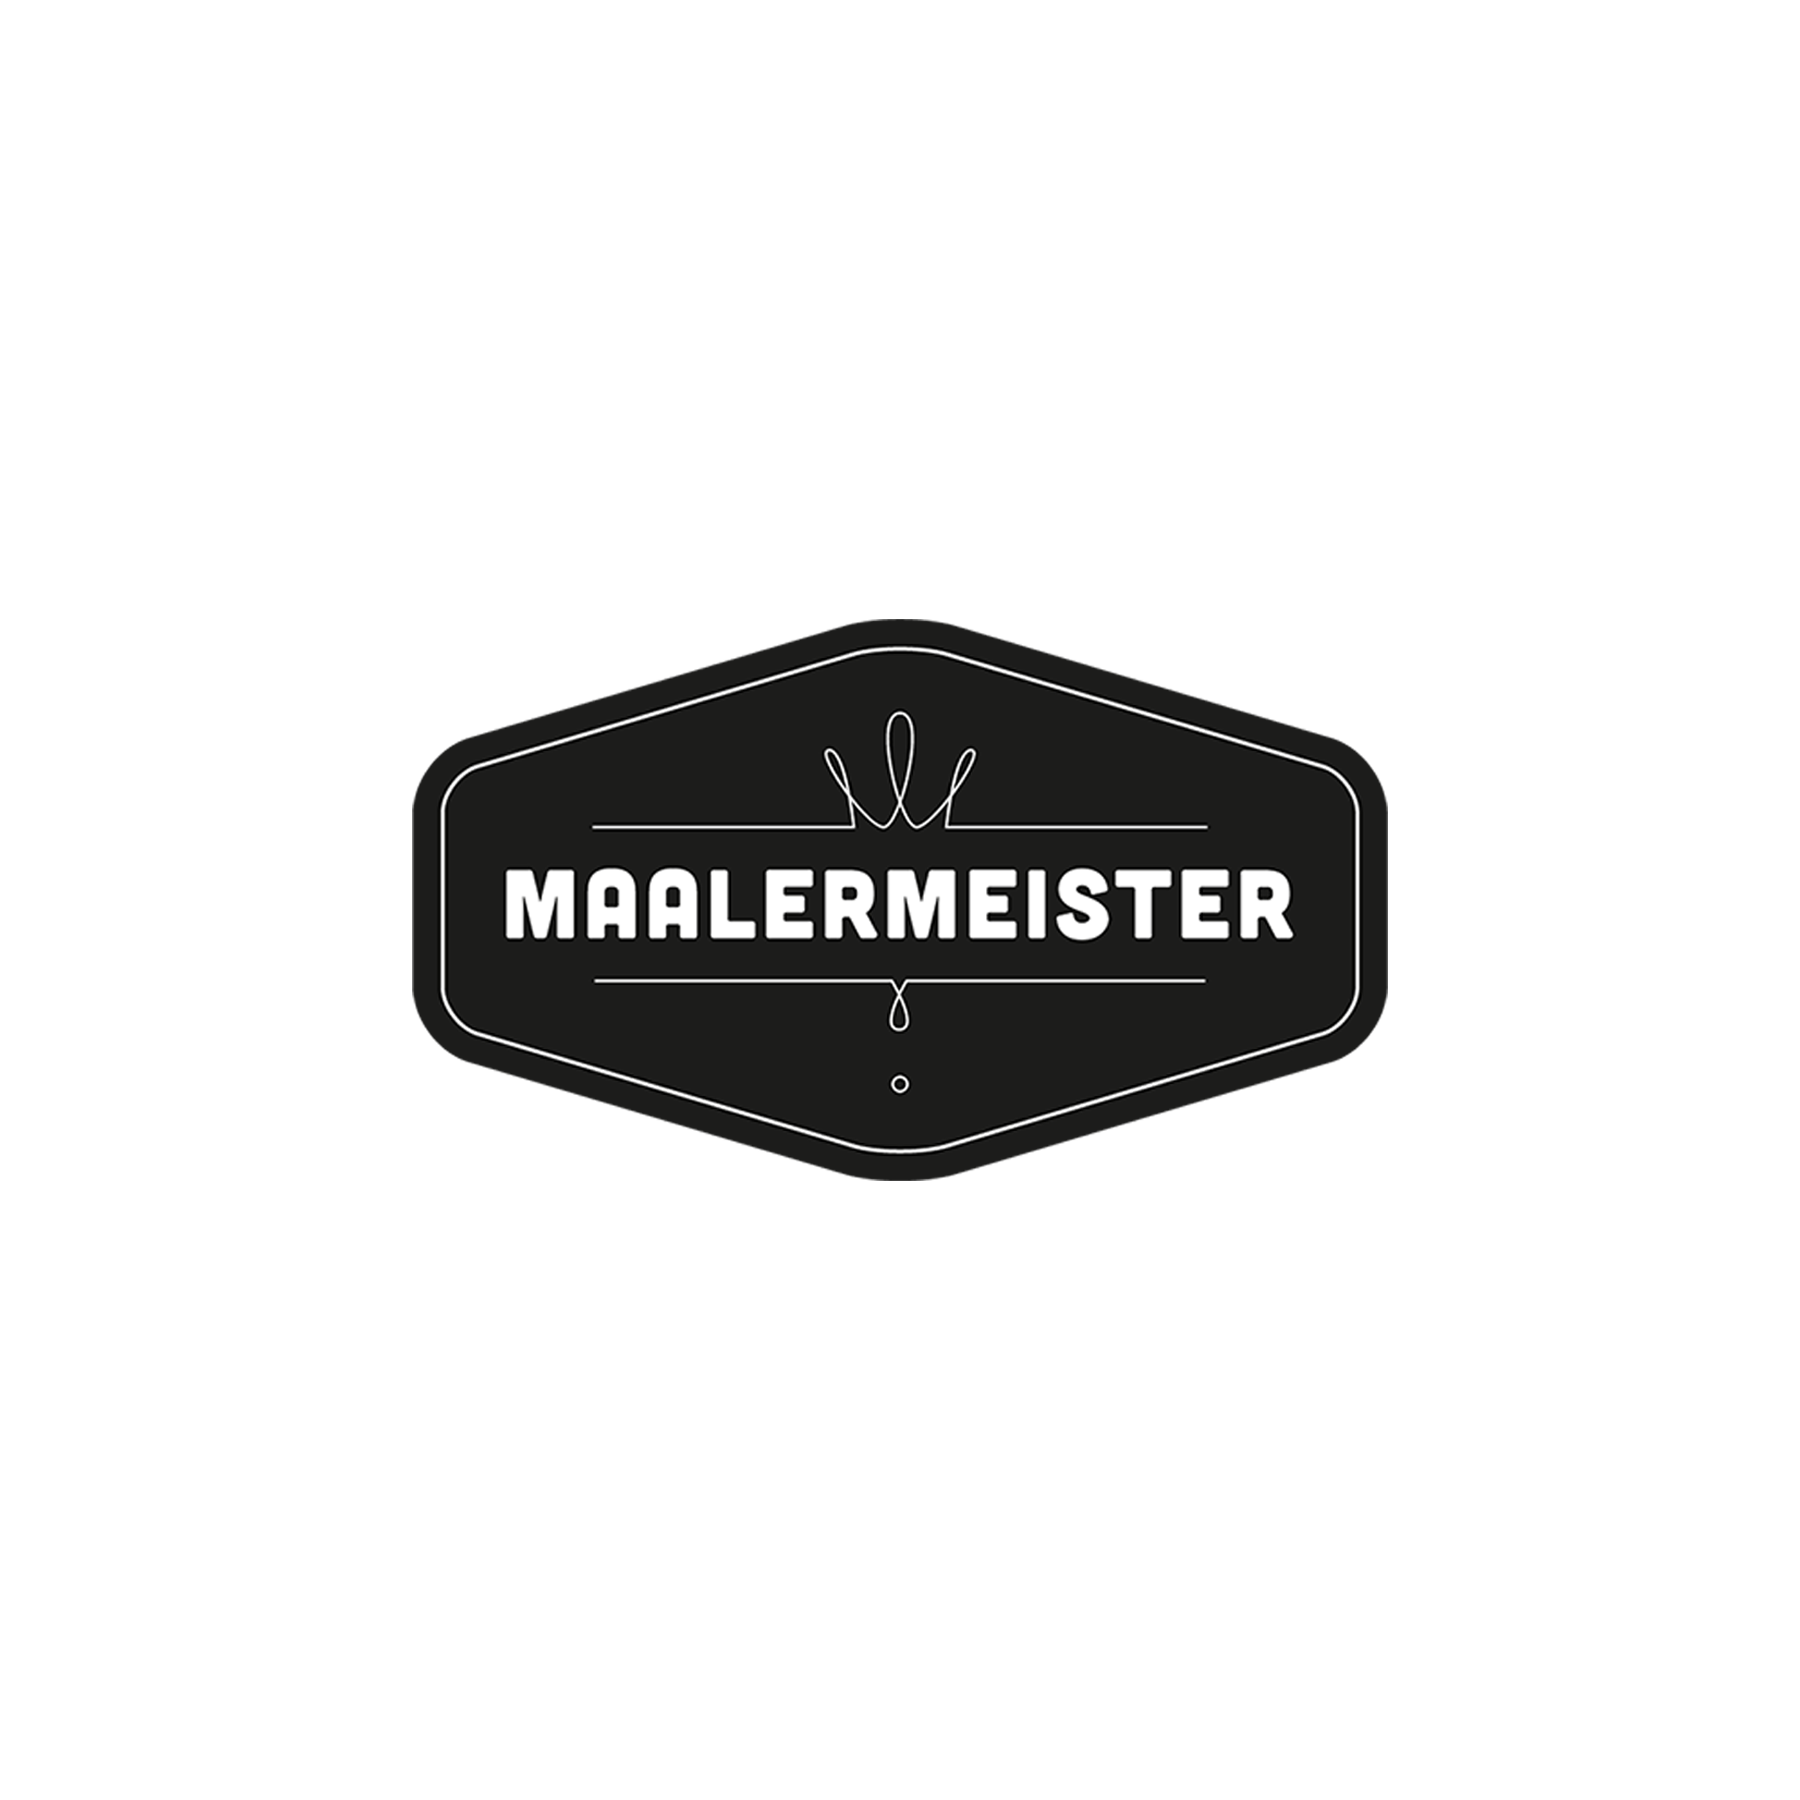 Maalermeister_1800x1800px